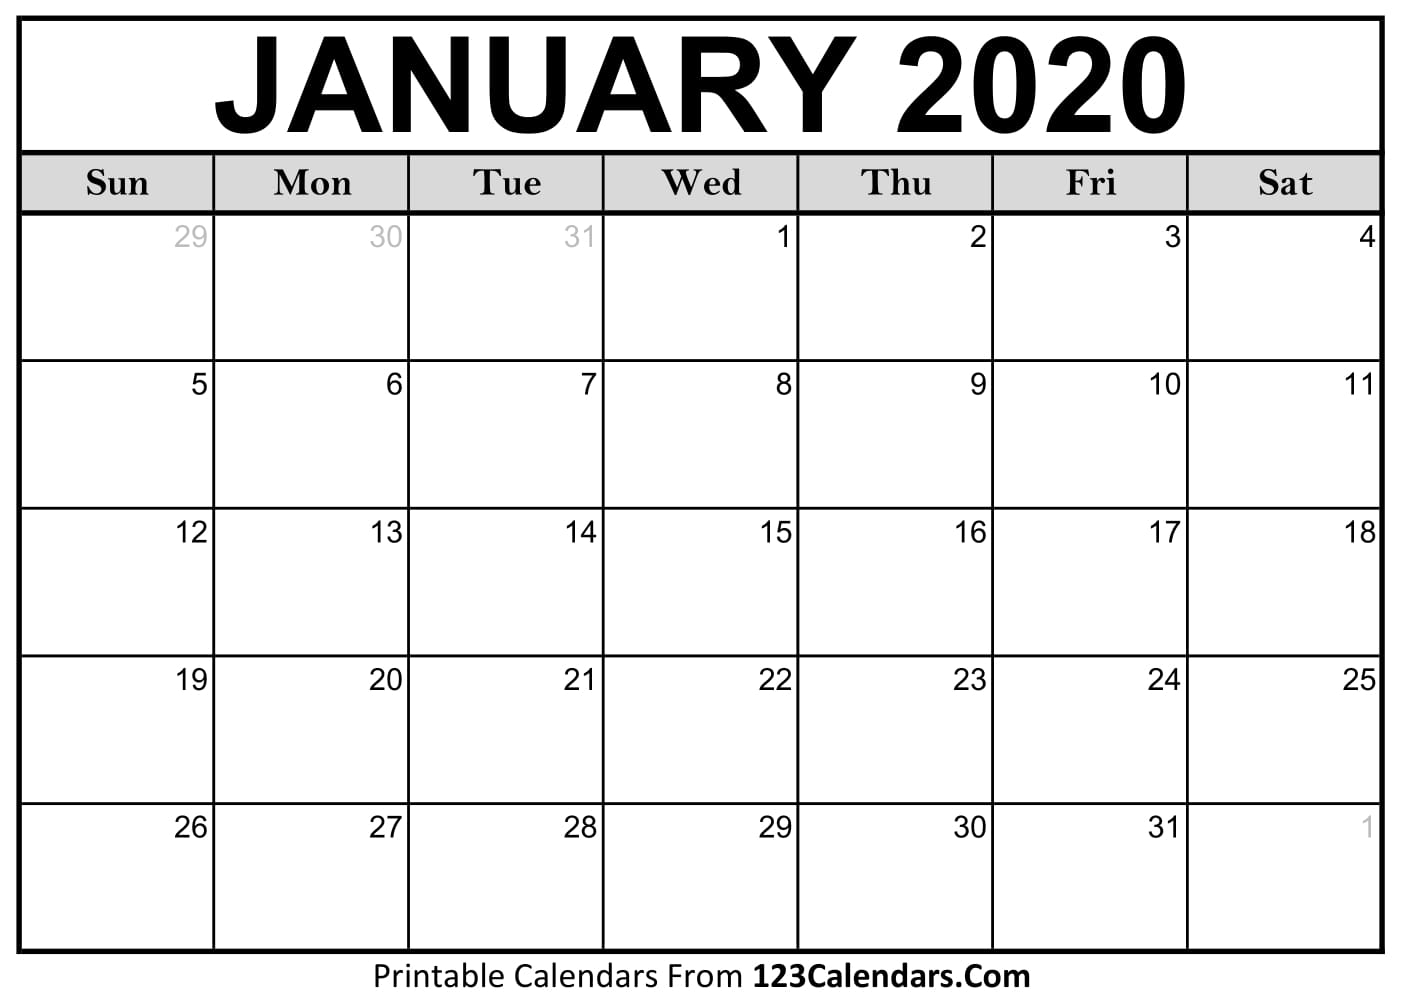 January Printable Calendars - Wpa.wpart.co